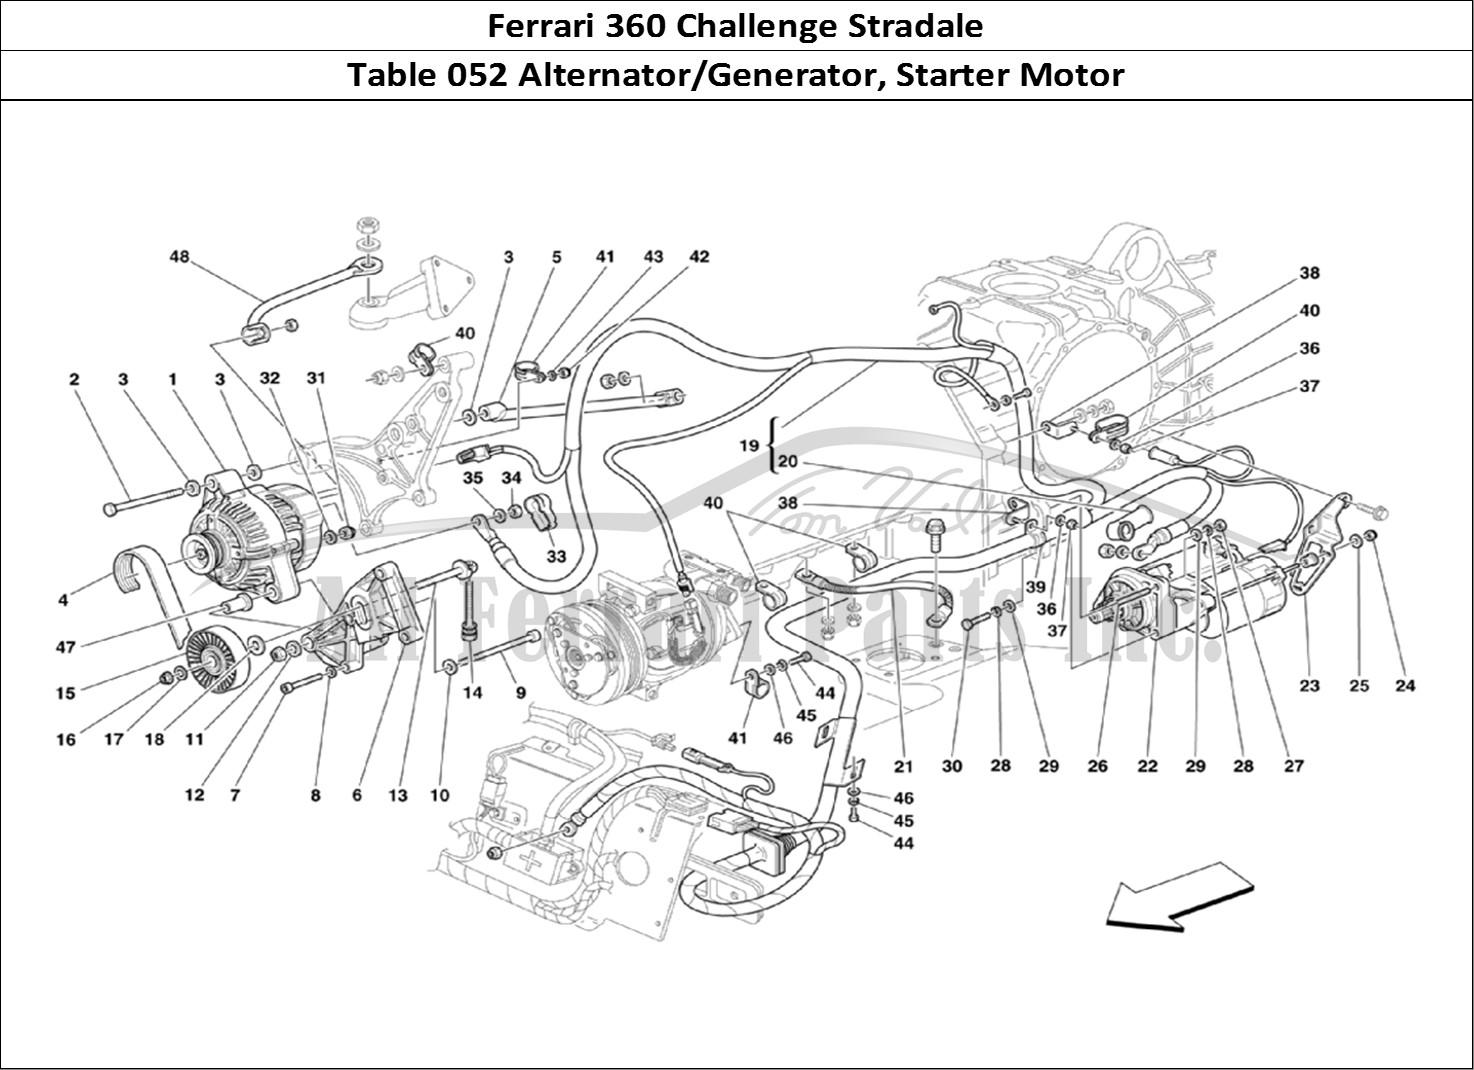 Buy Original Ferrari 360 Challenge Stradale 052 Alternator